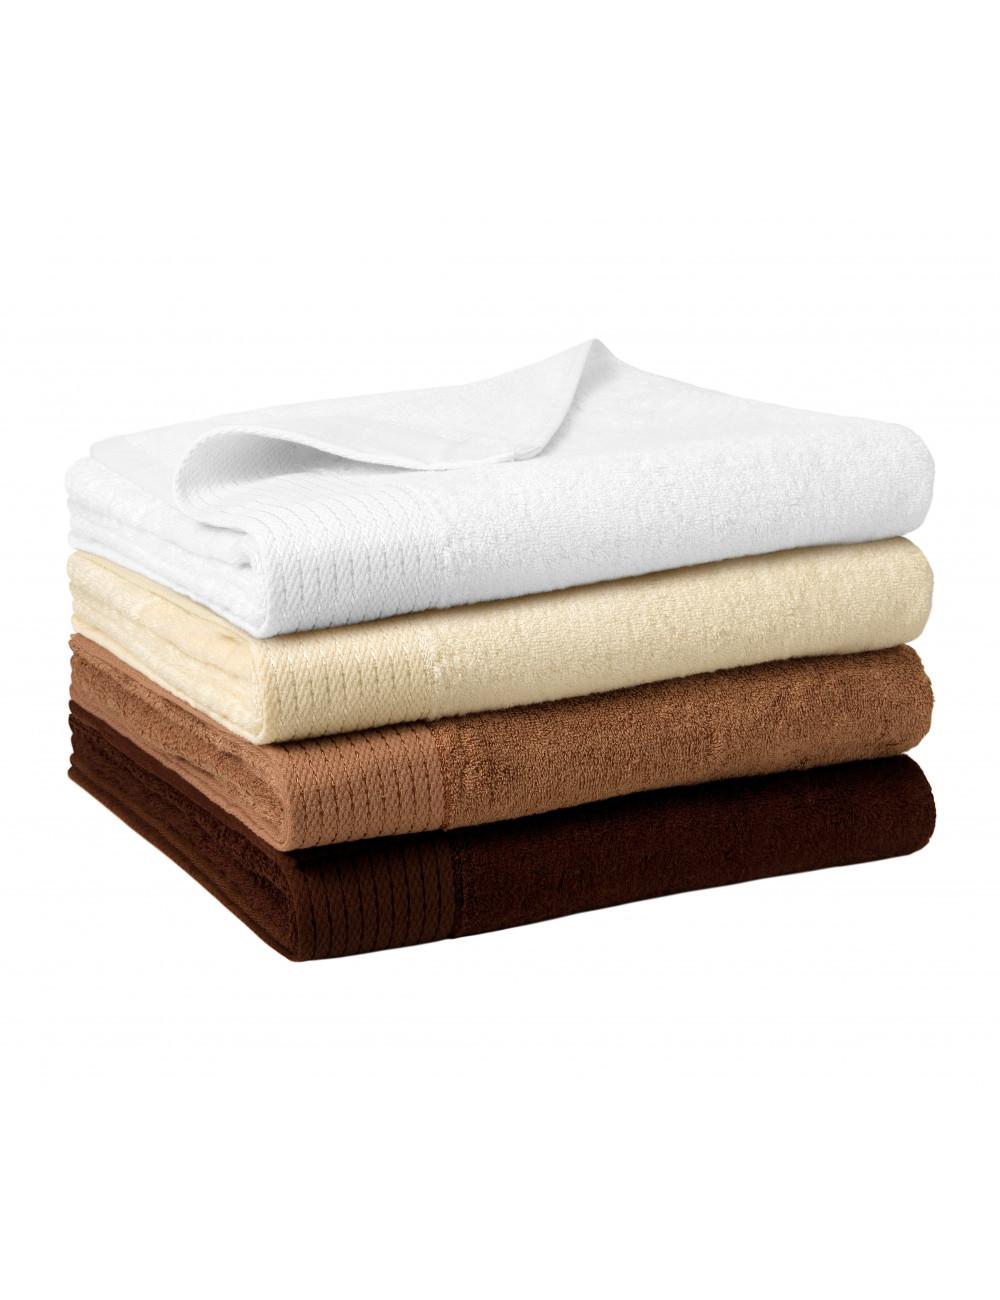 Adler MALFINIPREMIUM Ręcznik duży unisex Bamboo Bath Towel 952 nugatowy